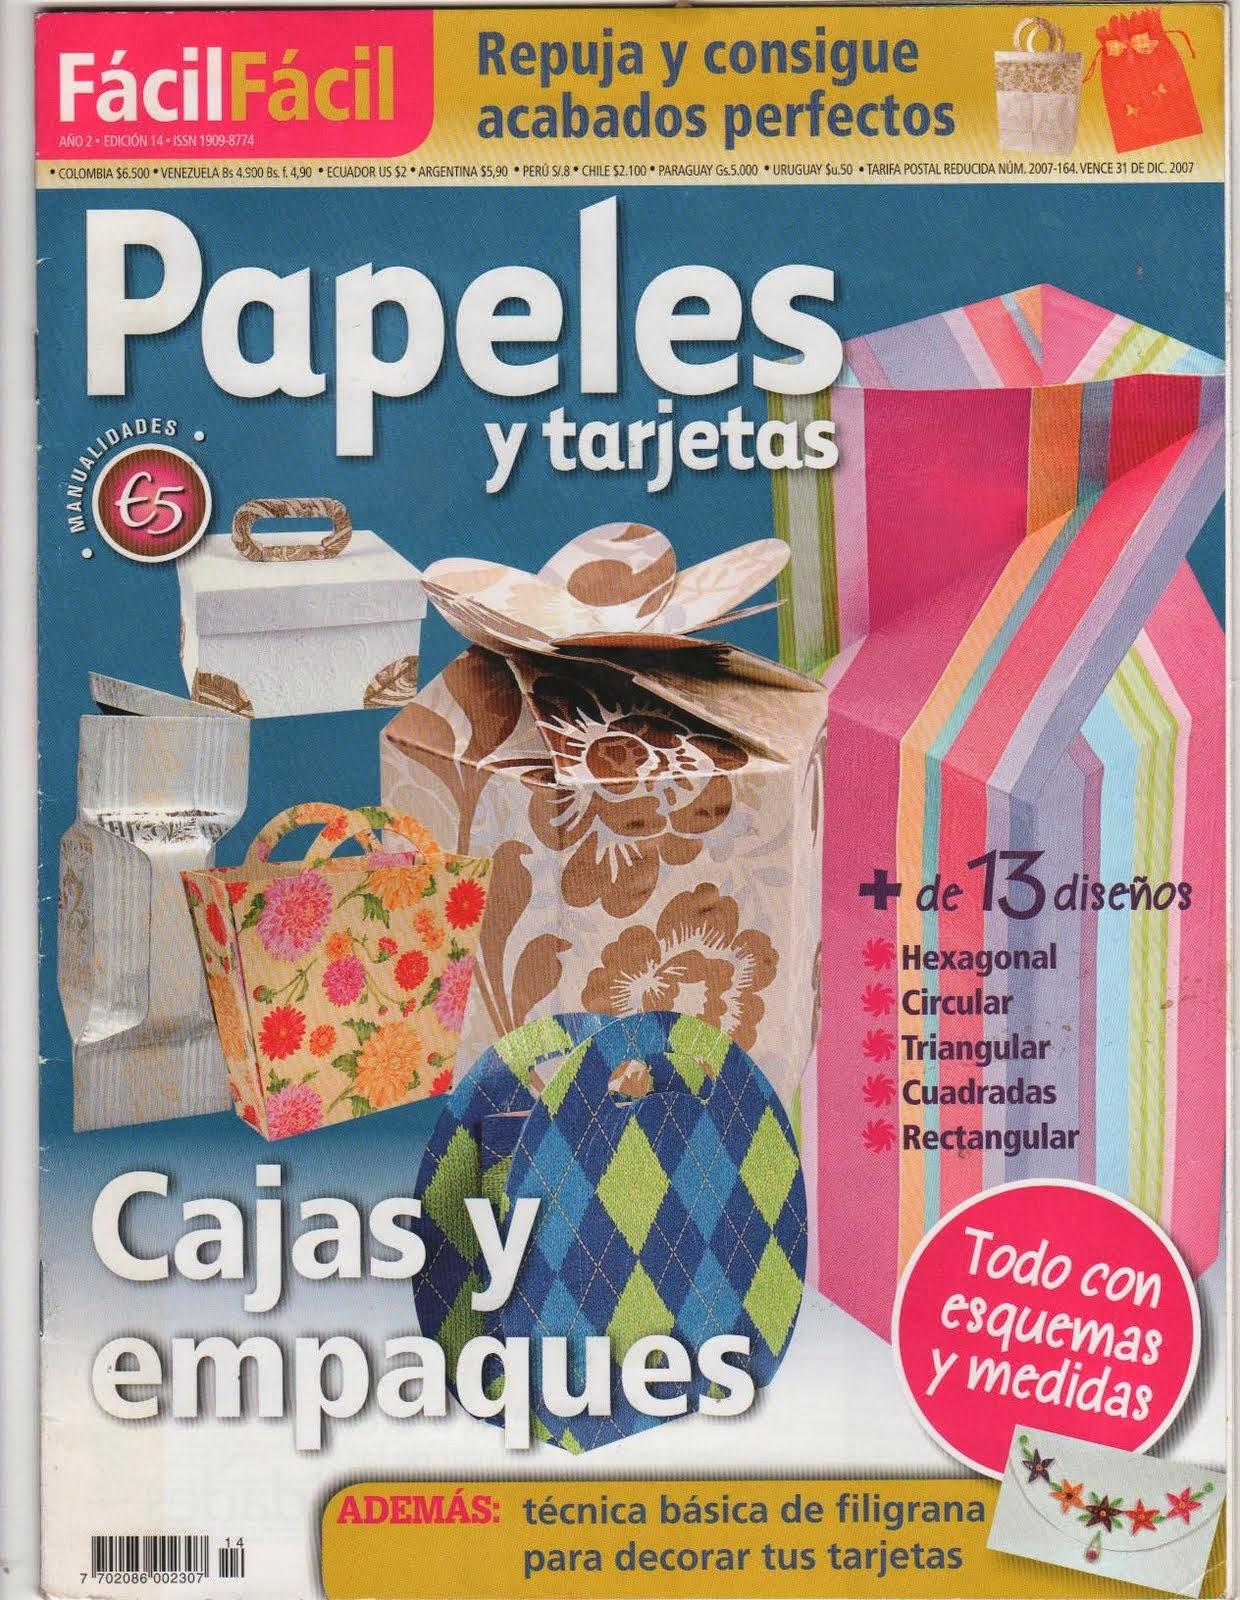 Revistas de decoracion gratis fabulous revista decoracin for Revistas de decoracion gratis